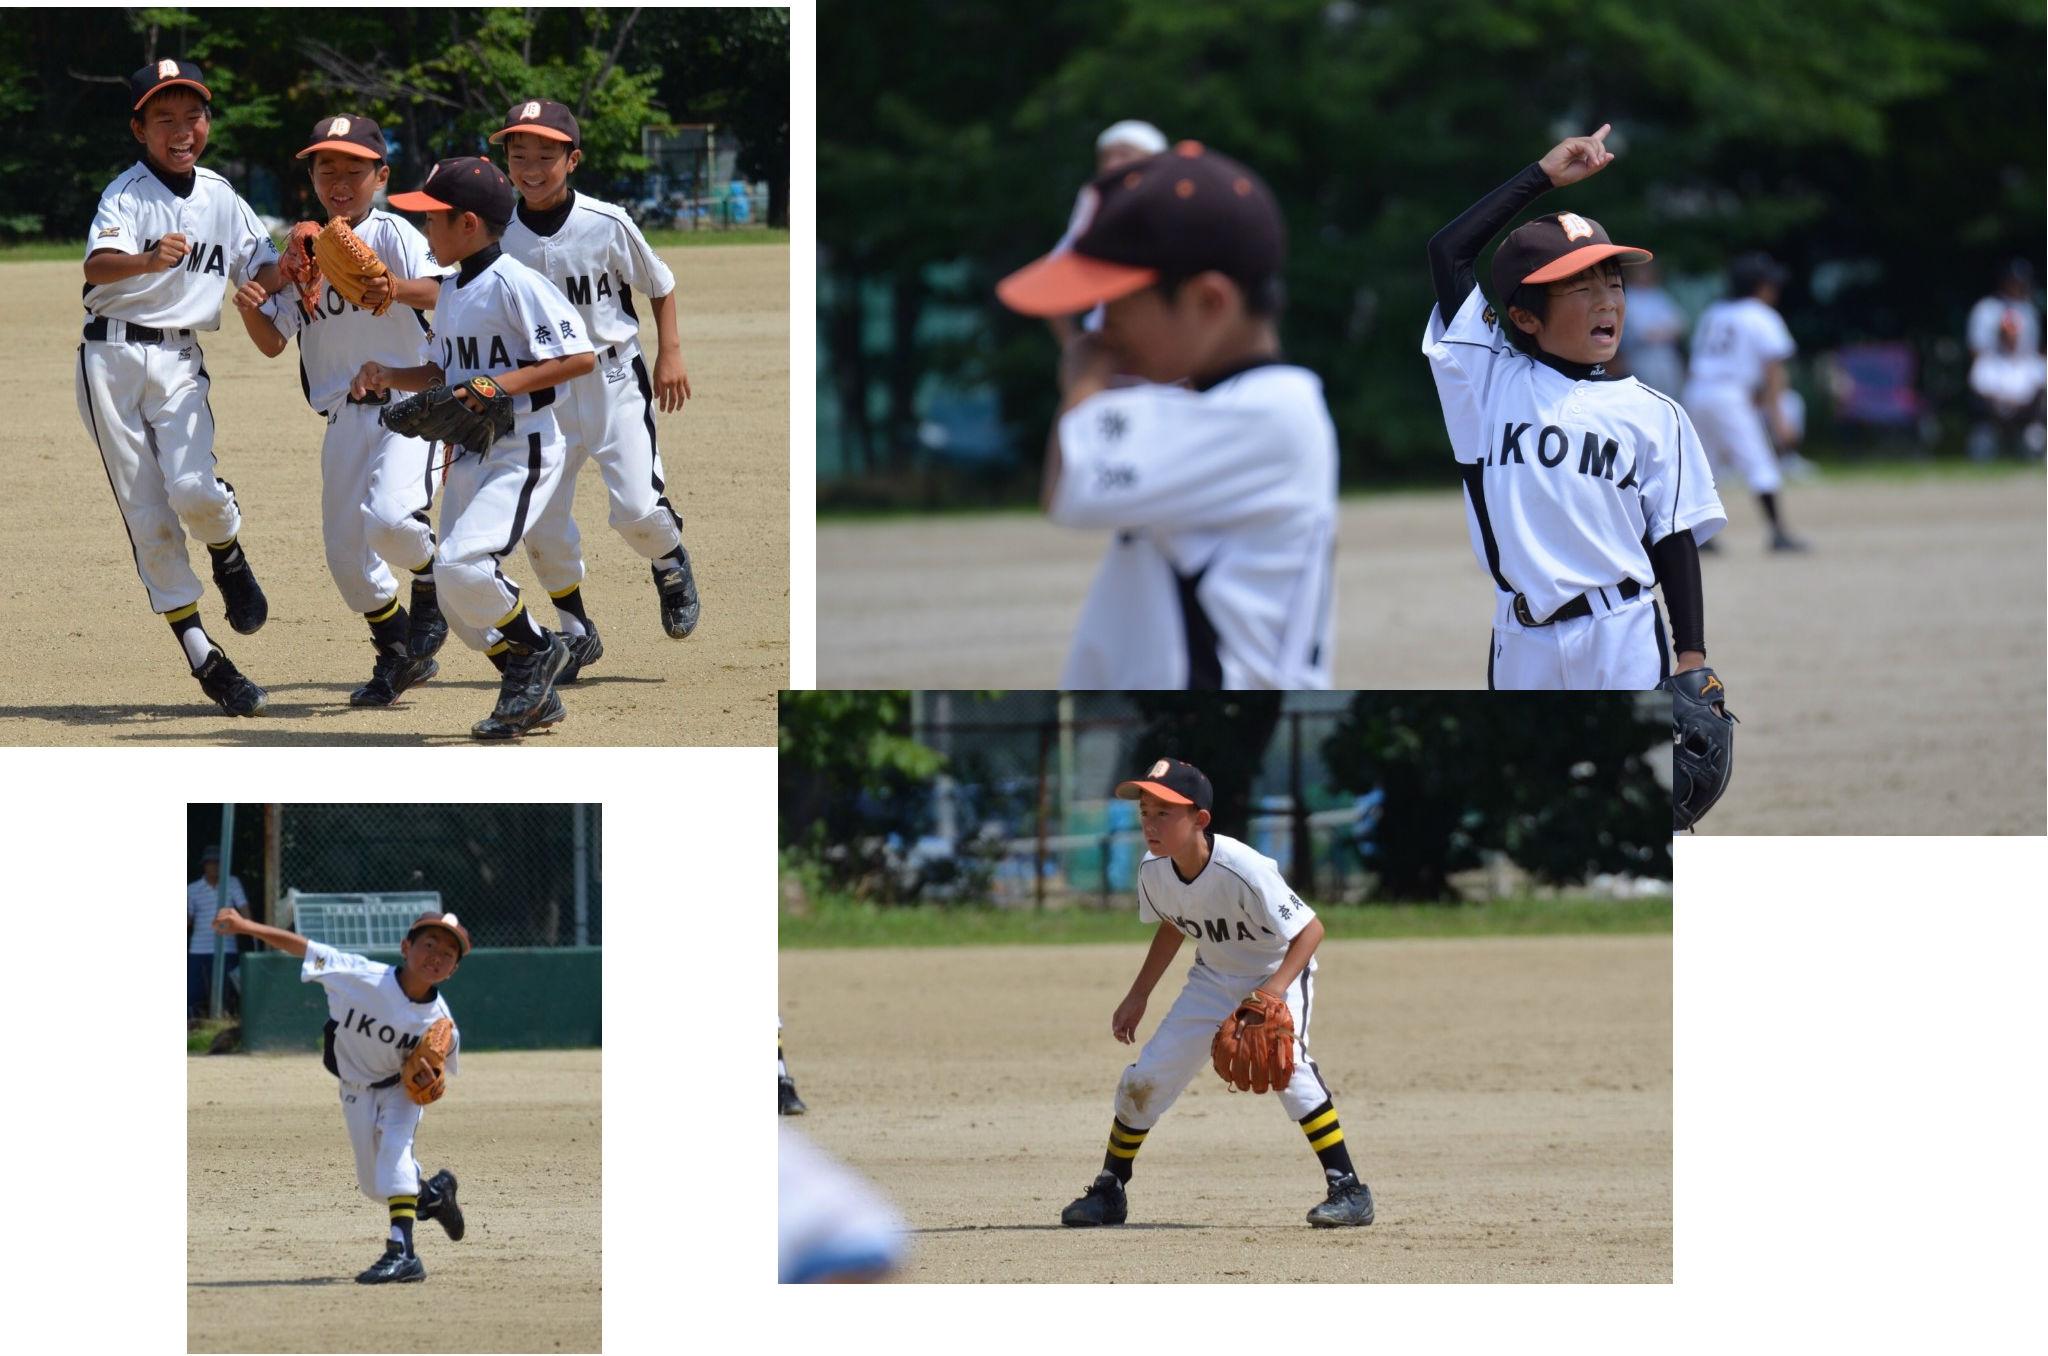 Bチーム 7/2(土) 奈良東ロータリークラブ杯 順位決定戦_b0296154_2213738.jpg